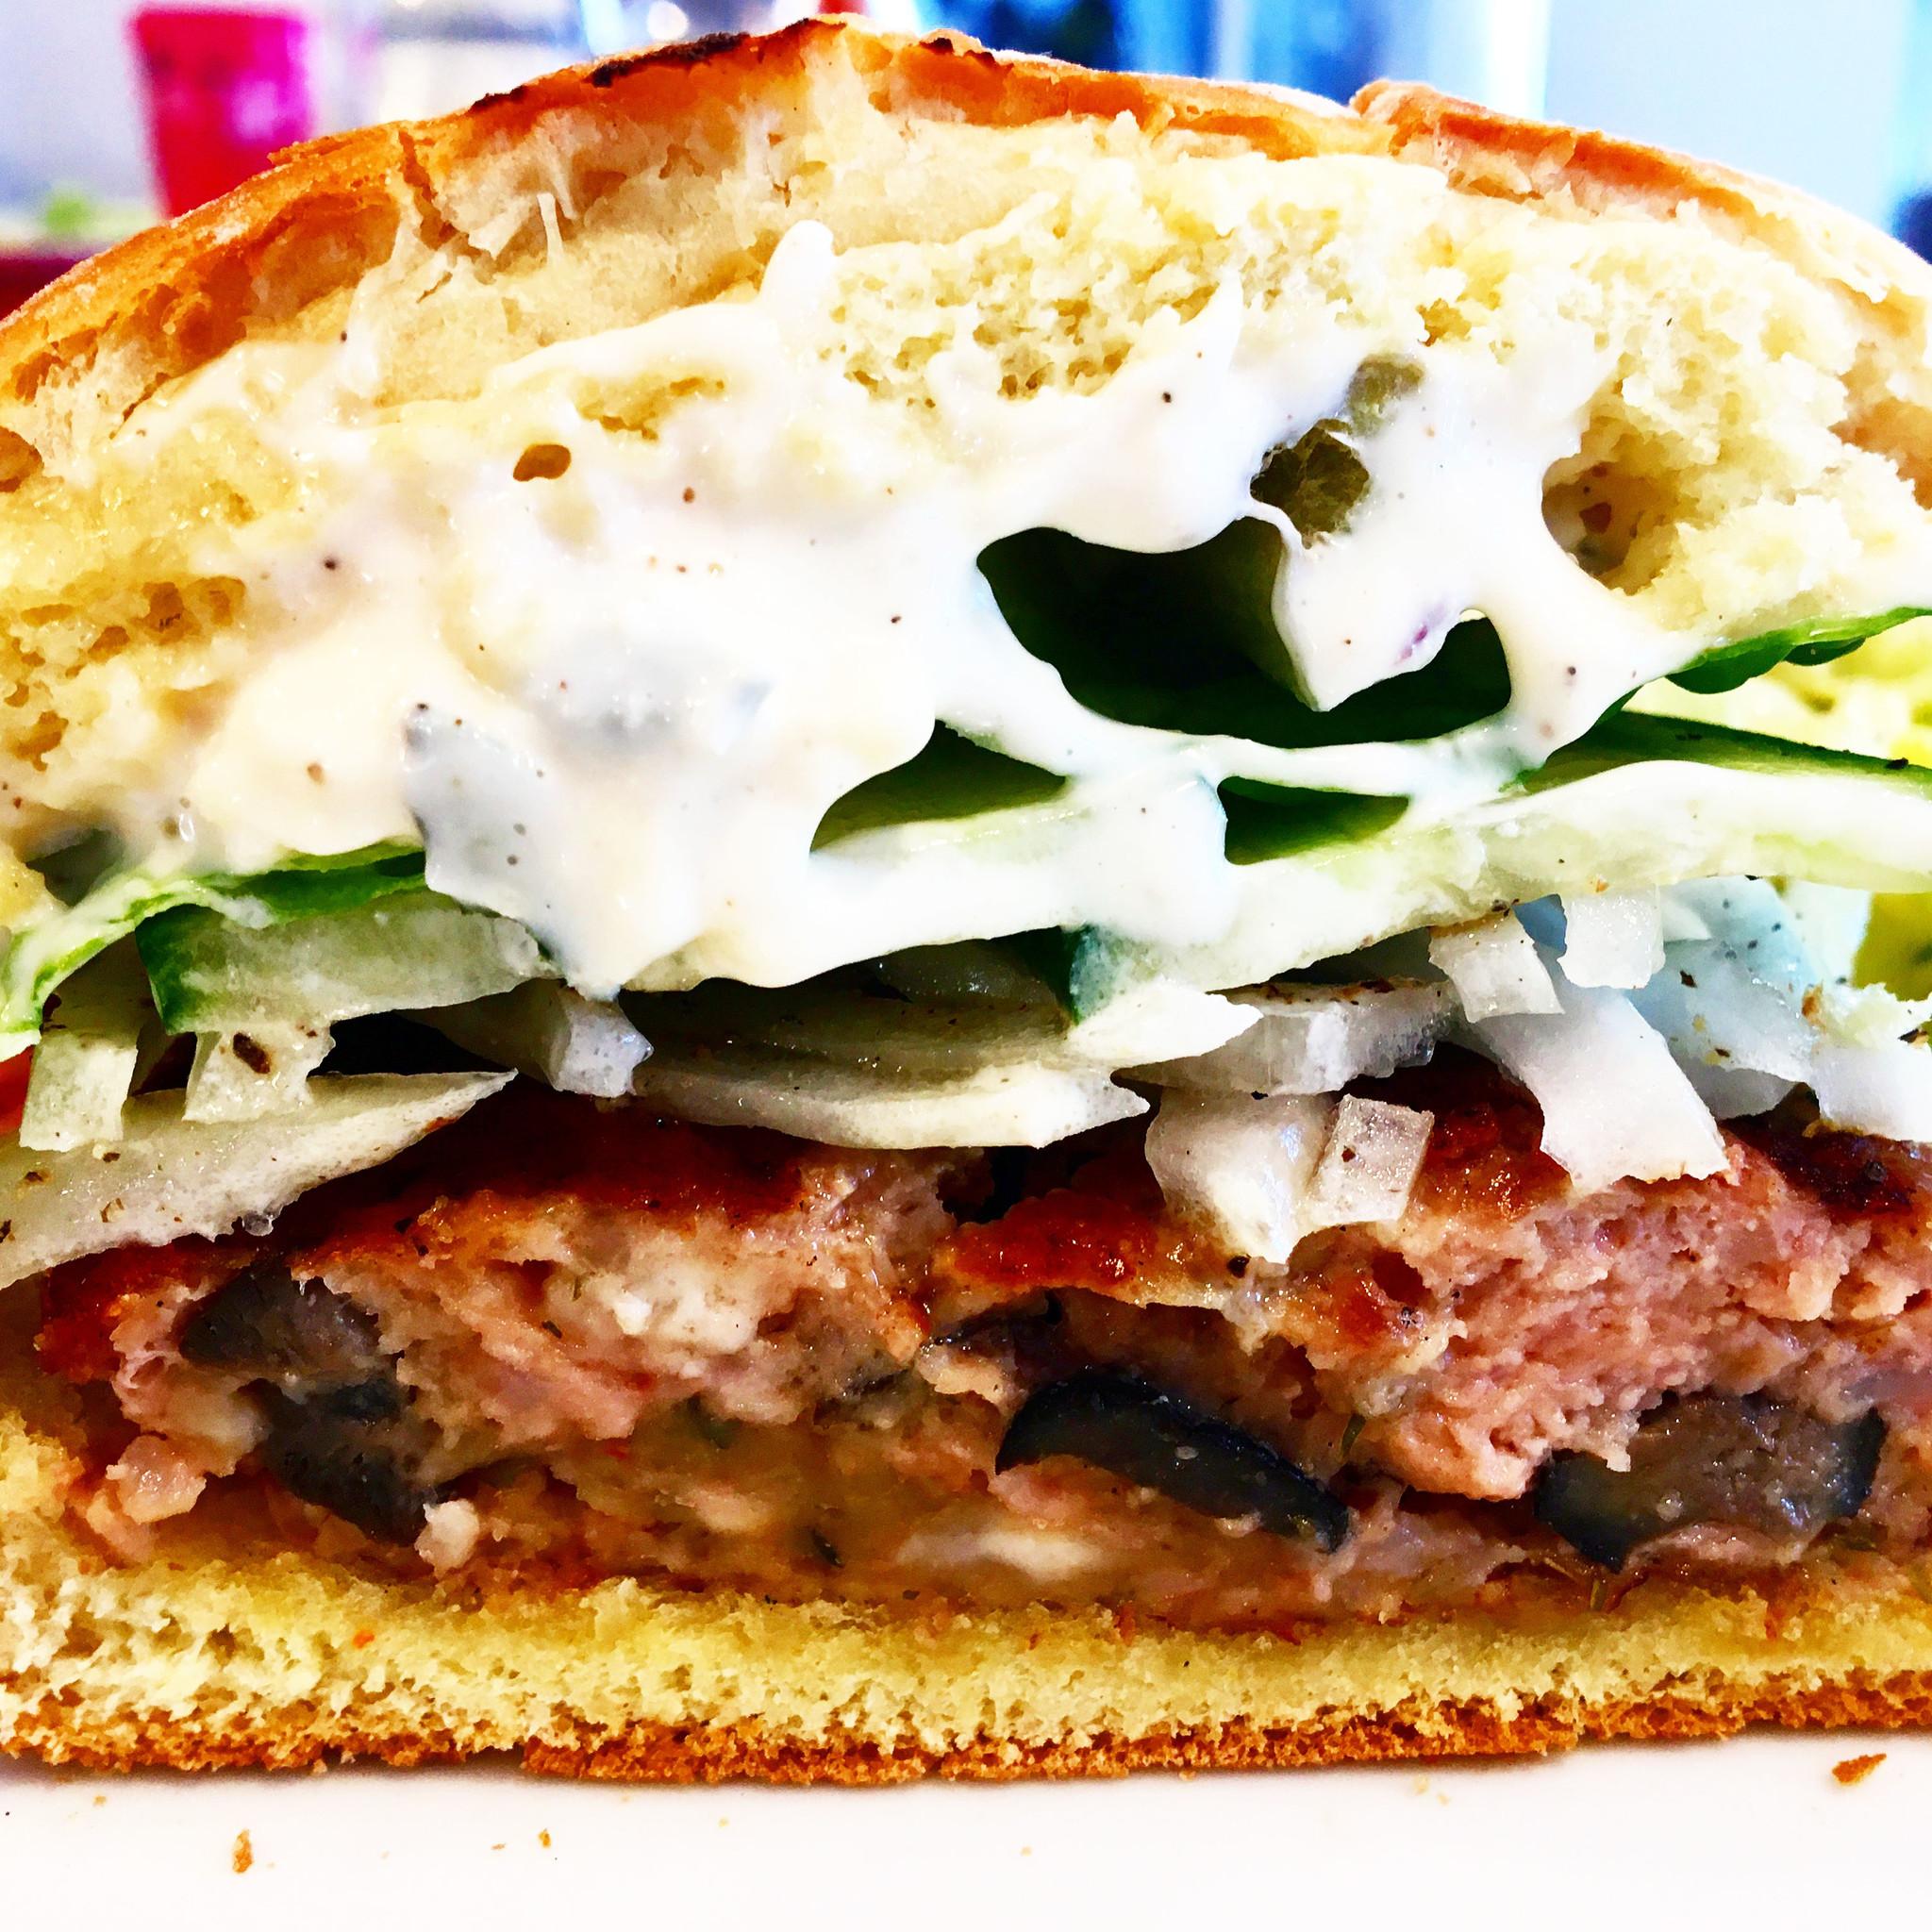 Greek style pork & feta cheese burger